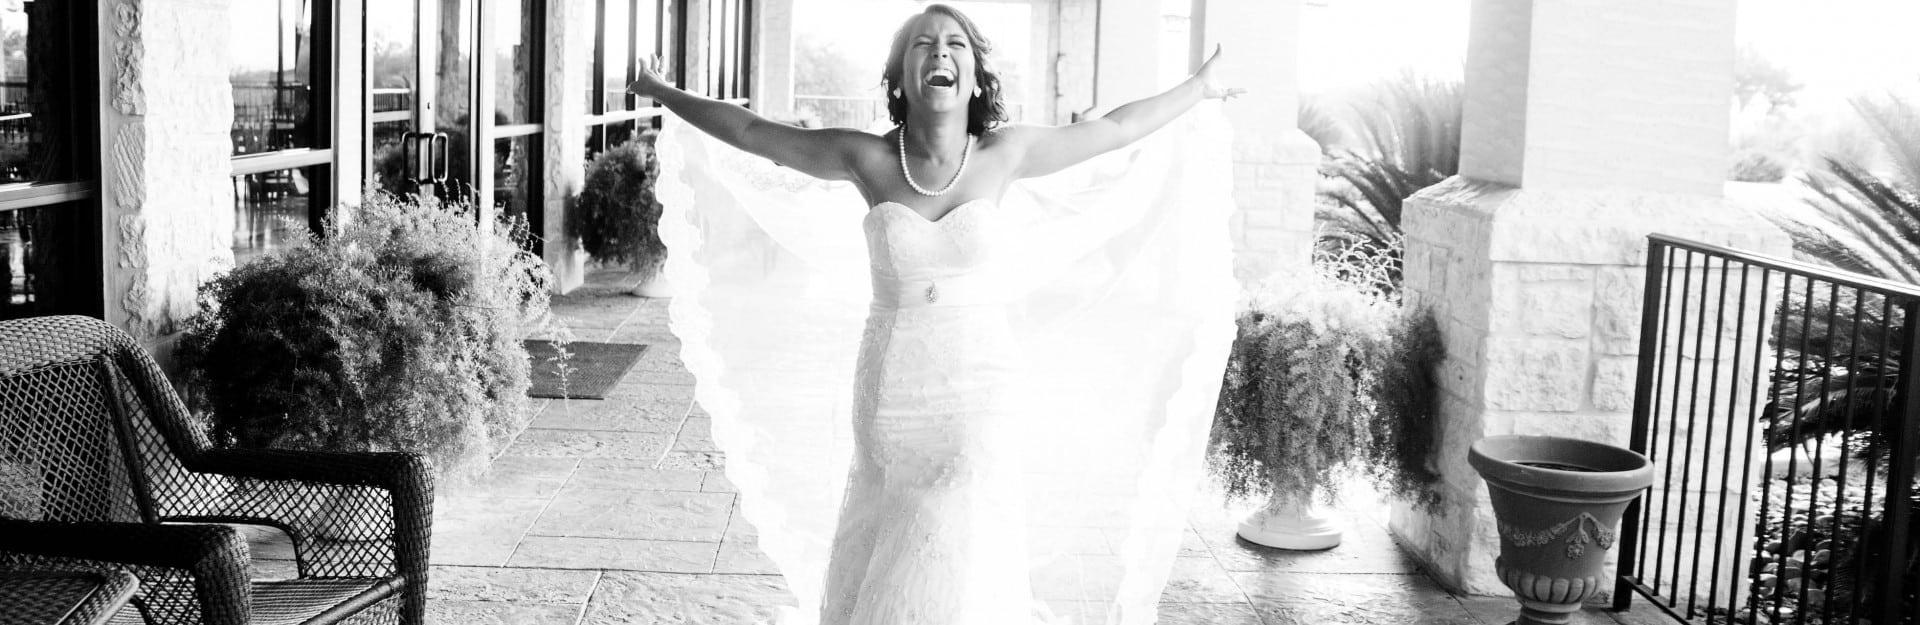 San Antonio wedding planner, Day of wedding planner, Wedding Planner, Wedding Coordinator, Wedding Planning